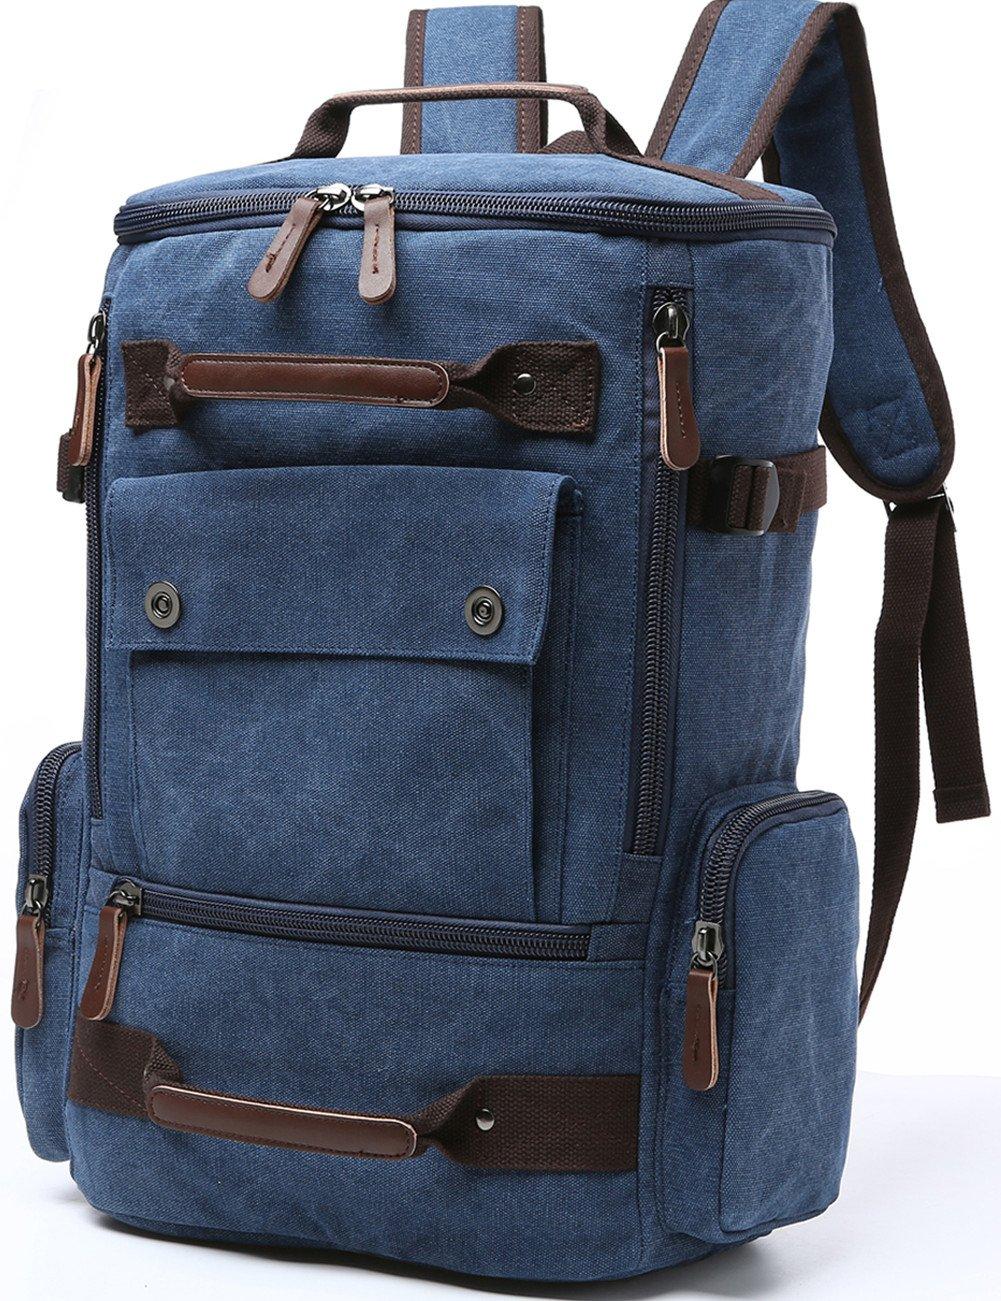 Canvas Backpack, Aidonger Vintage Canvas School Backpack Hiking Travel Rucksack Fits 15'' Laptop (Dark Blue)